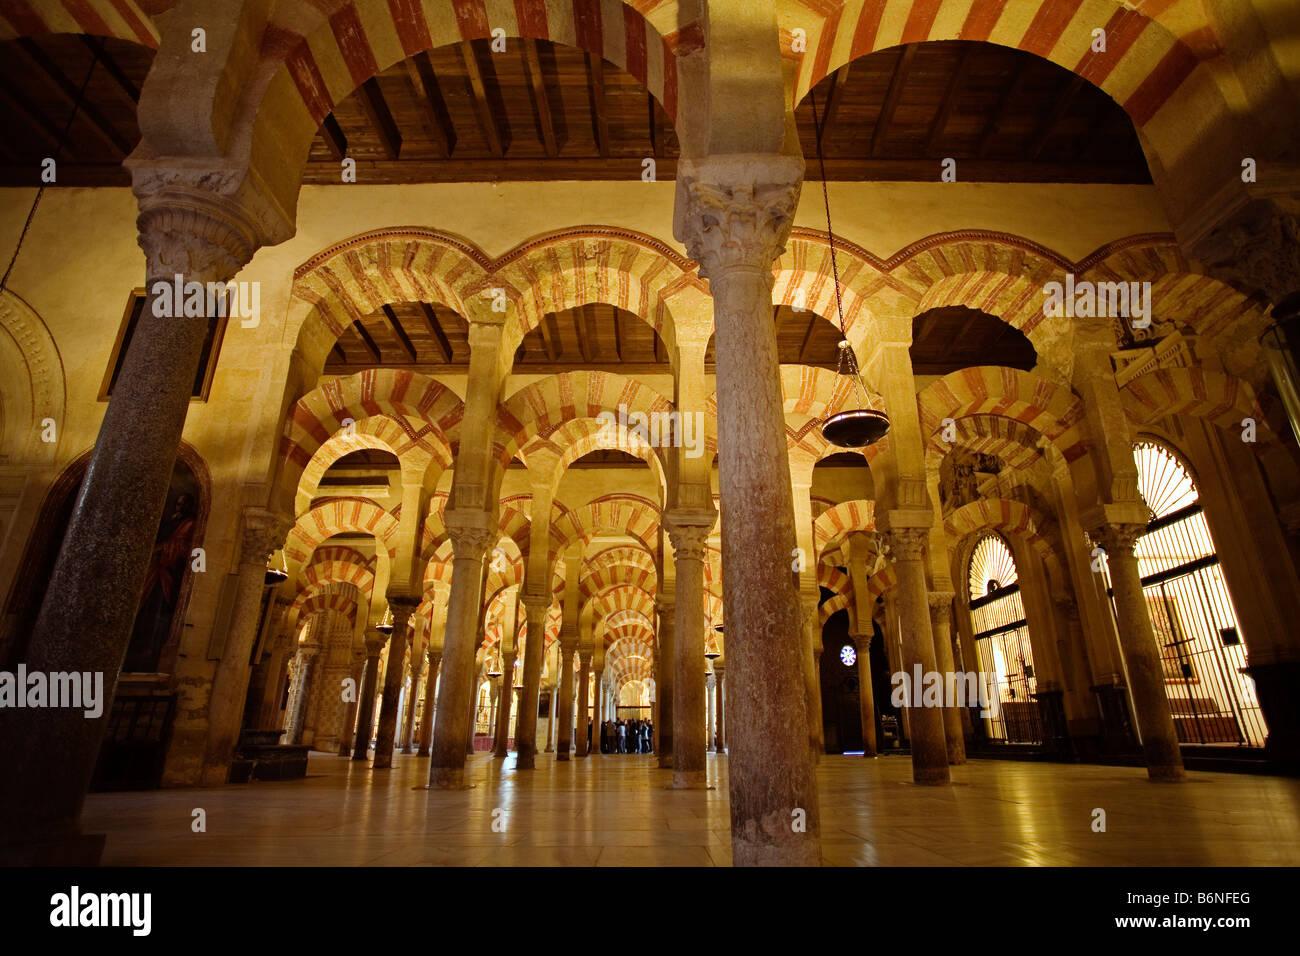 Column courtyard of the mosque cathedral cordoba andalusia spain columnas del interio de la mezquita catedral andalucia Stock Photo